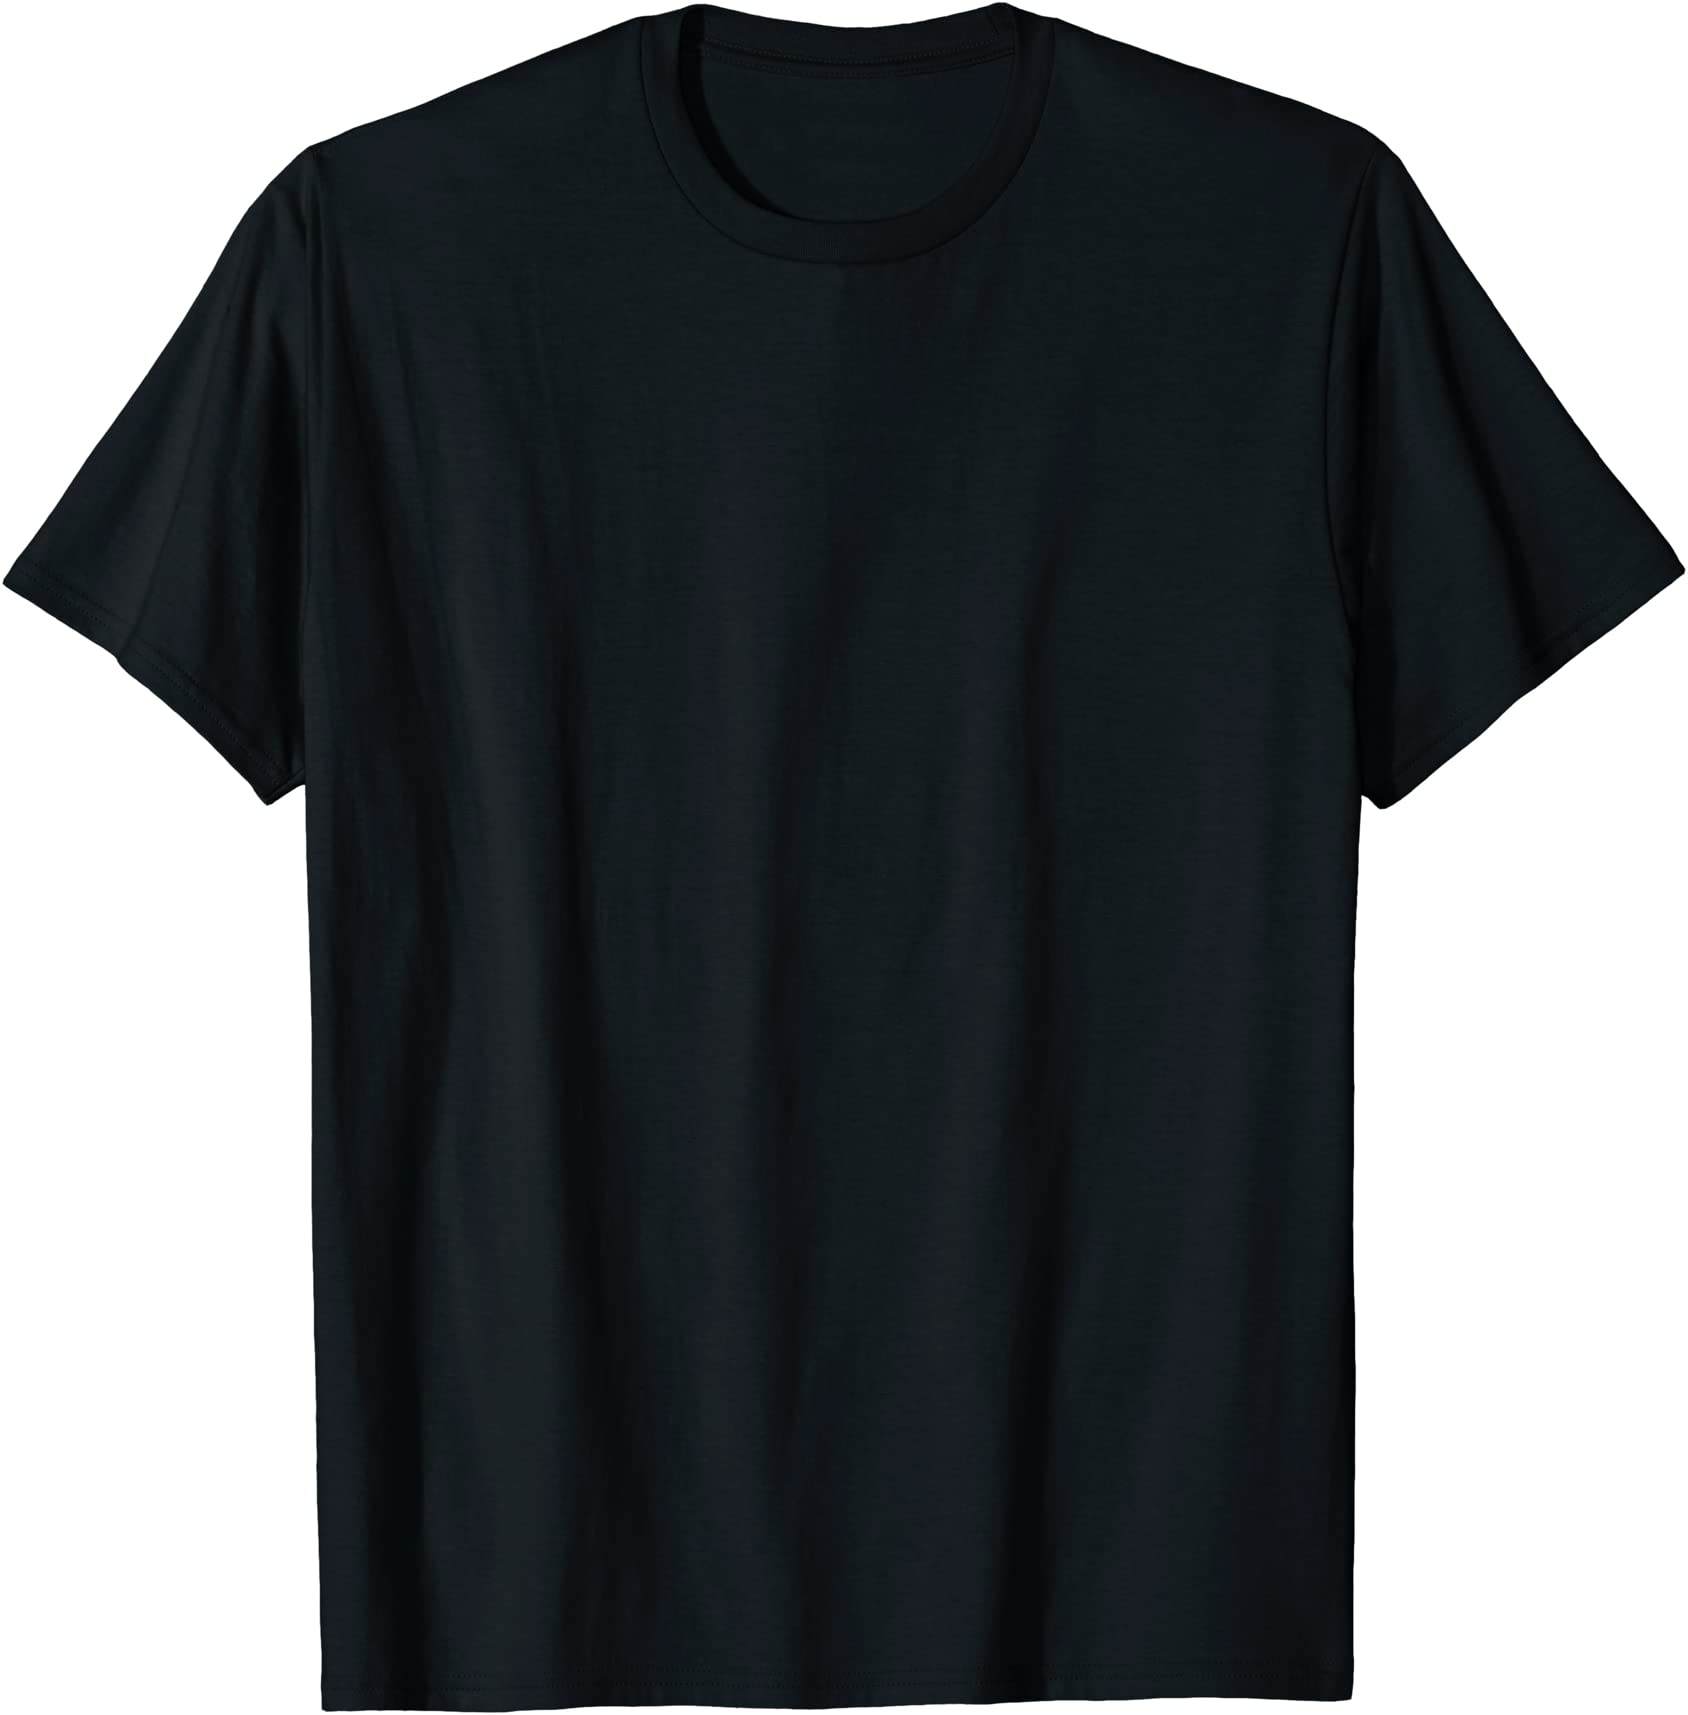 BABY TRUMP WITH PUTIN Men Black Tshirt Size S-2XL